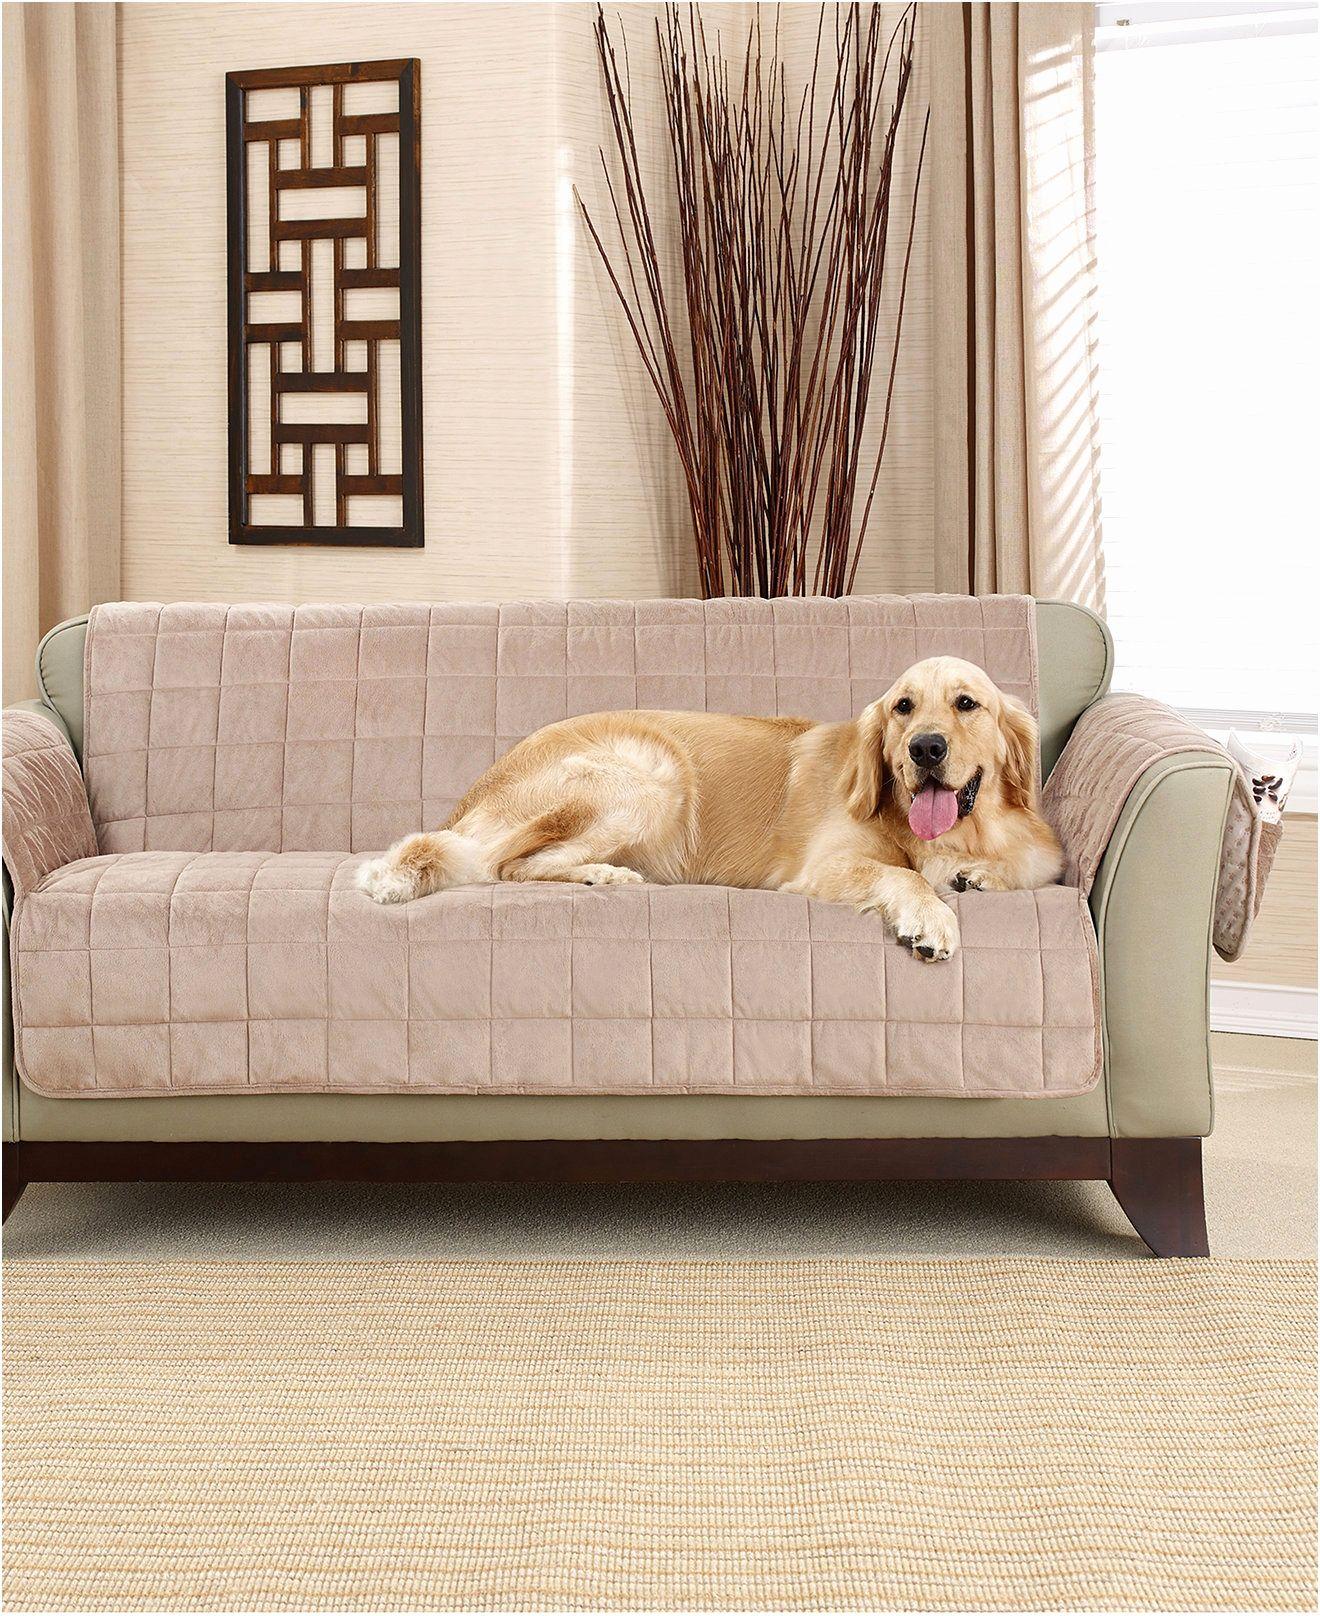 Luxury Pet Sofa Cover Picture Pet Sofa Cover New Sofa Pet Sofa